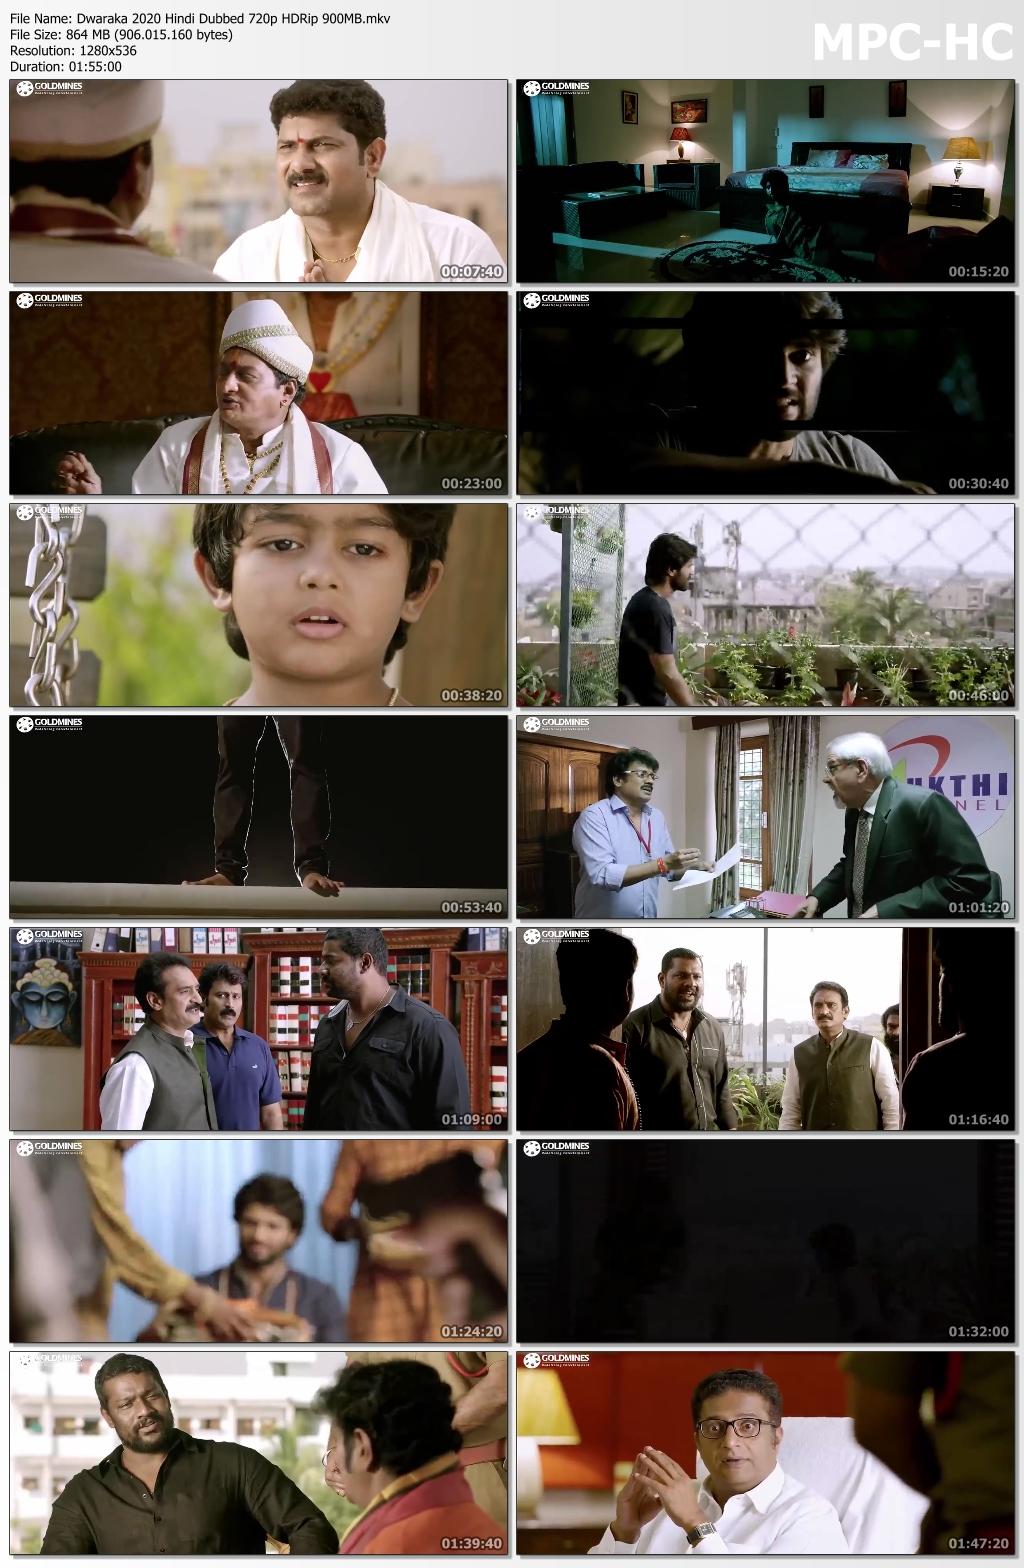 Dwaraka-2020-Hindi-Dubbed-720p-HDRip-900-MB-mkv-thumbs